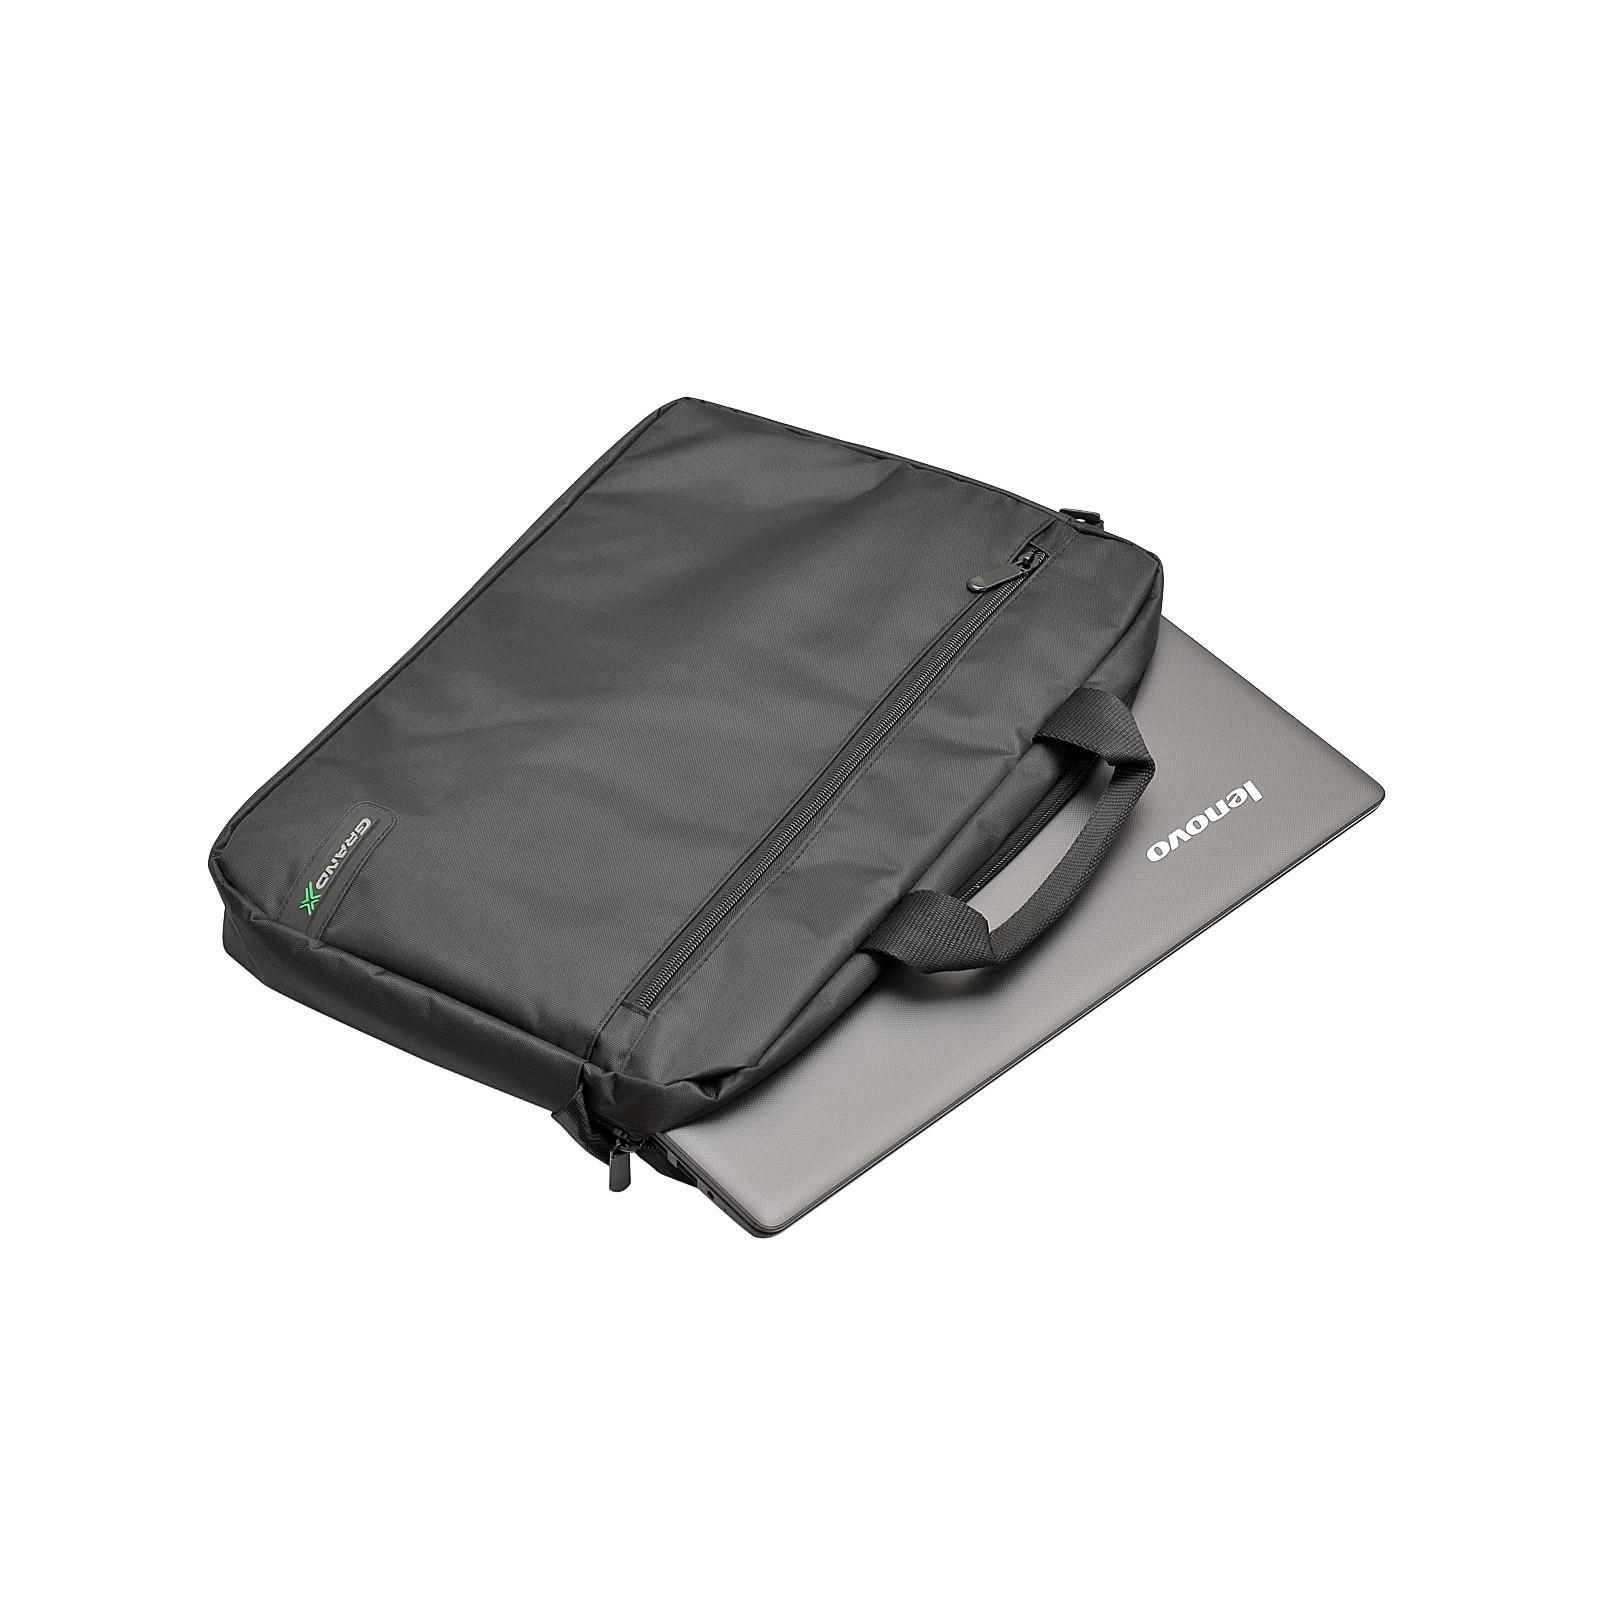 Сумка для ноутбука Grand-X 15.6'' Black (SB-120) изображение 4